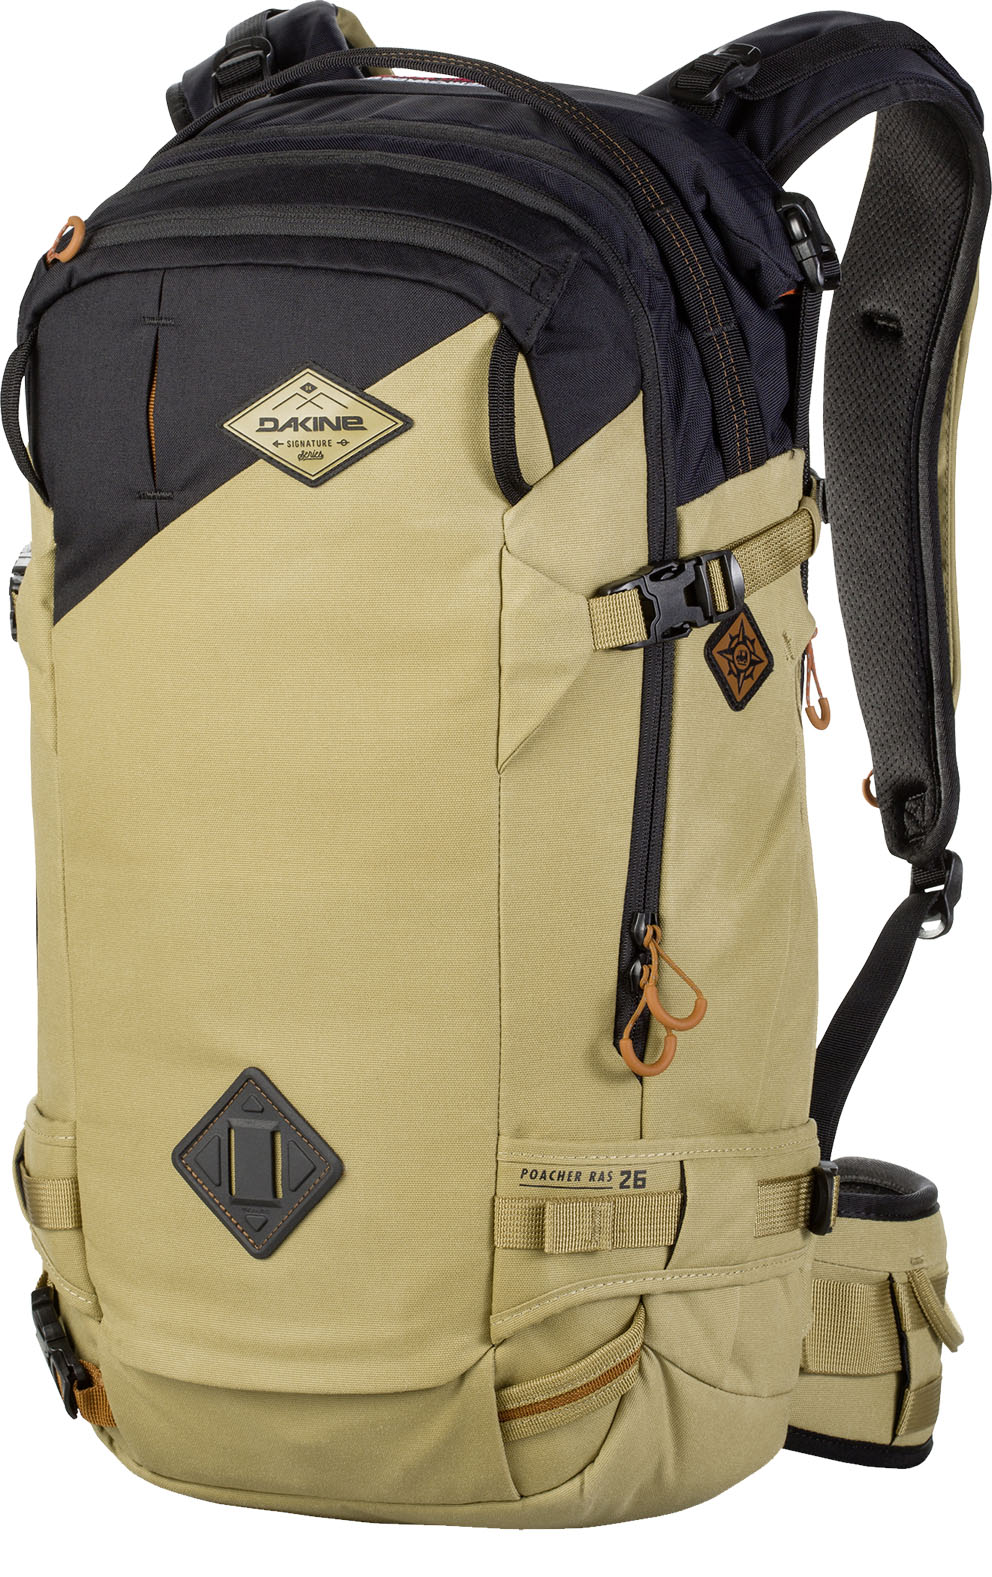 Dakine: Team Poacher R.A.S. 26L 18/19